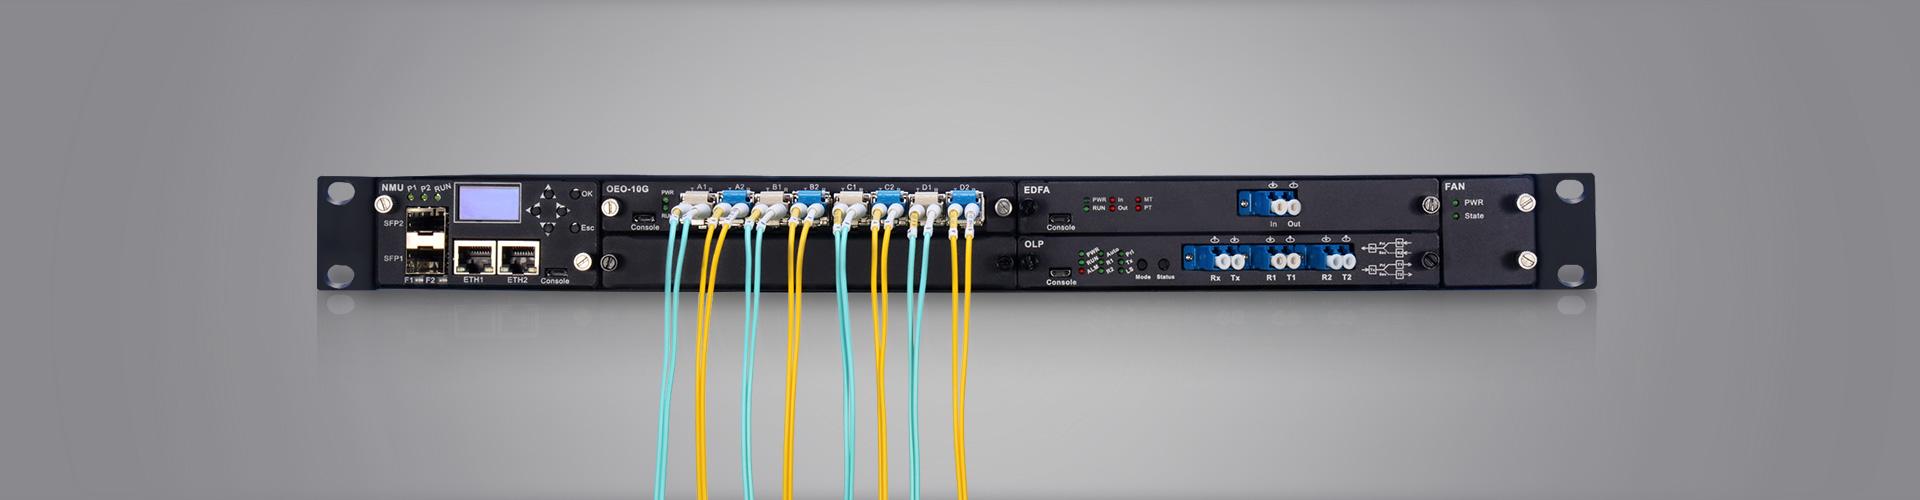 fs network_series_04.jpg